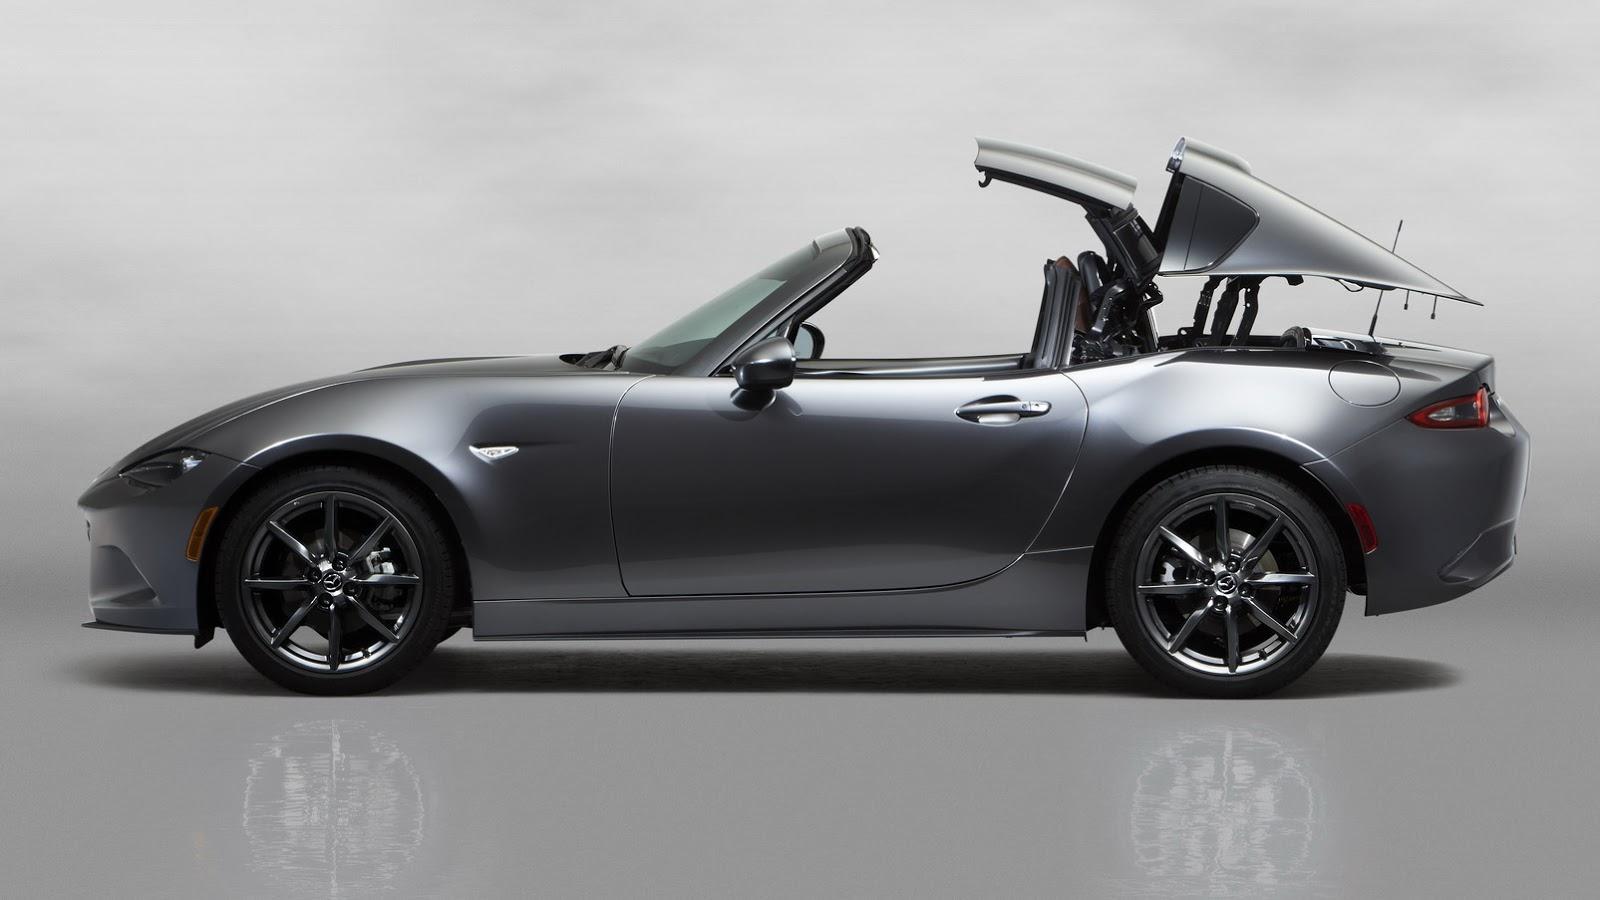 Mazda : To MX-5 με εντυπωσιακή σκληρή οροφή